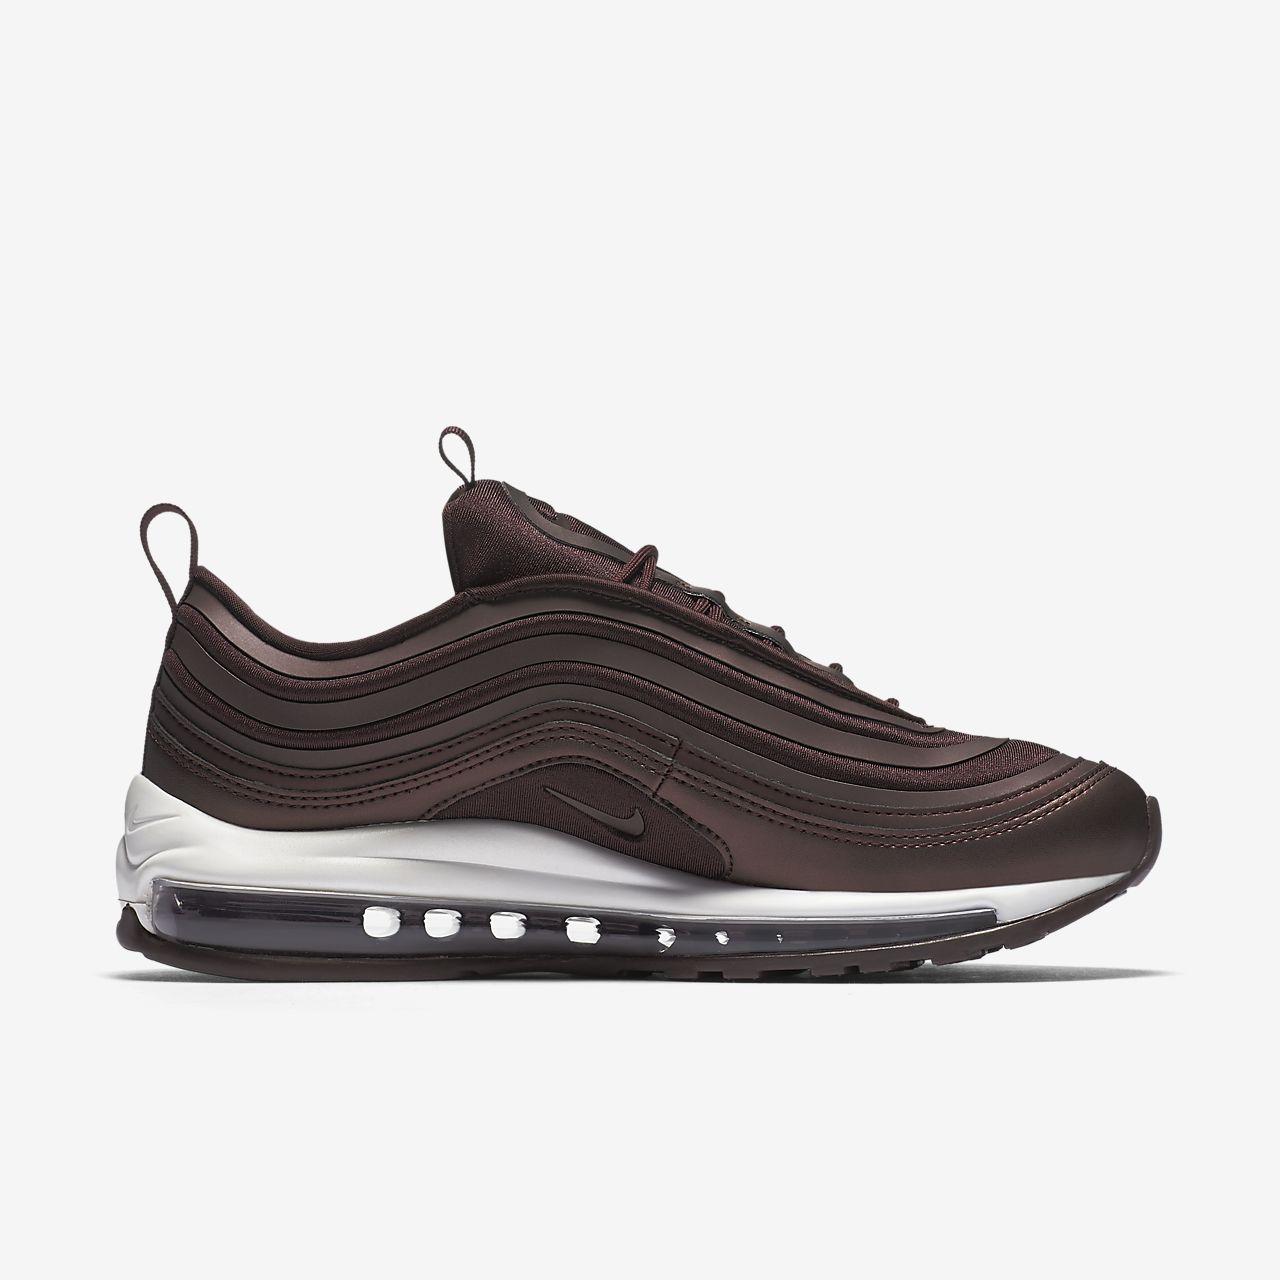 scarpe nike air max 97 ultra '17